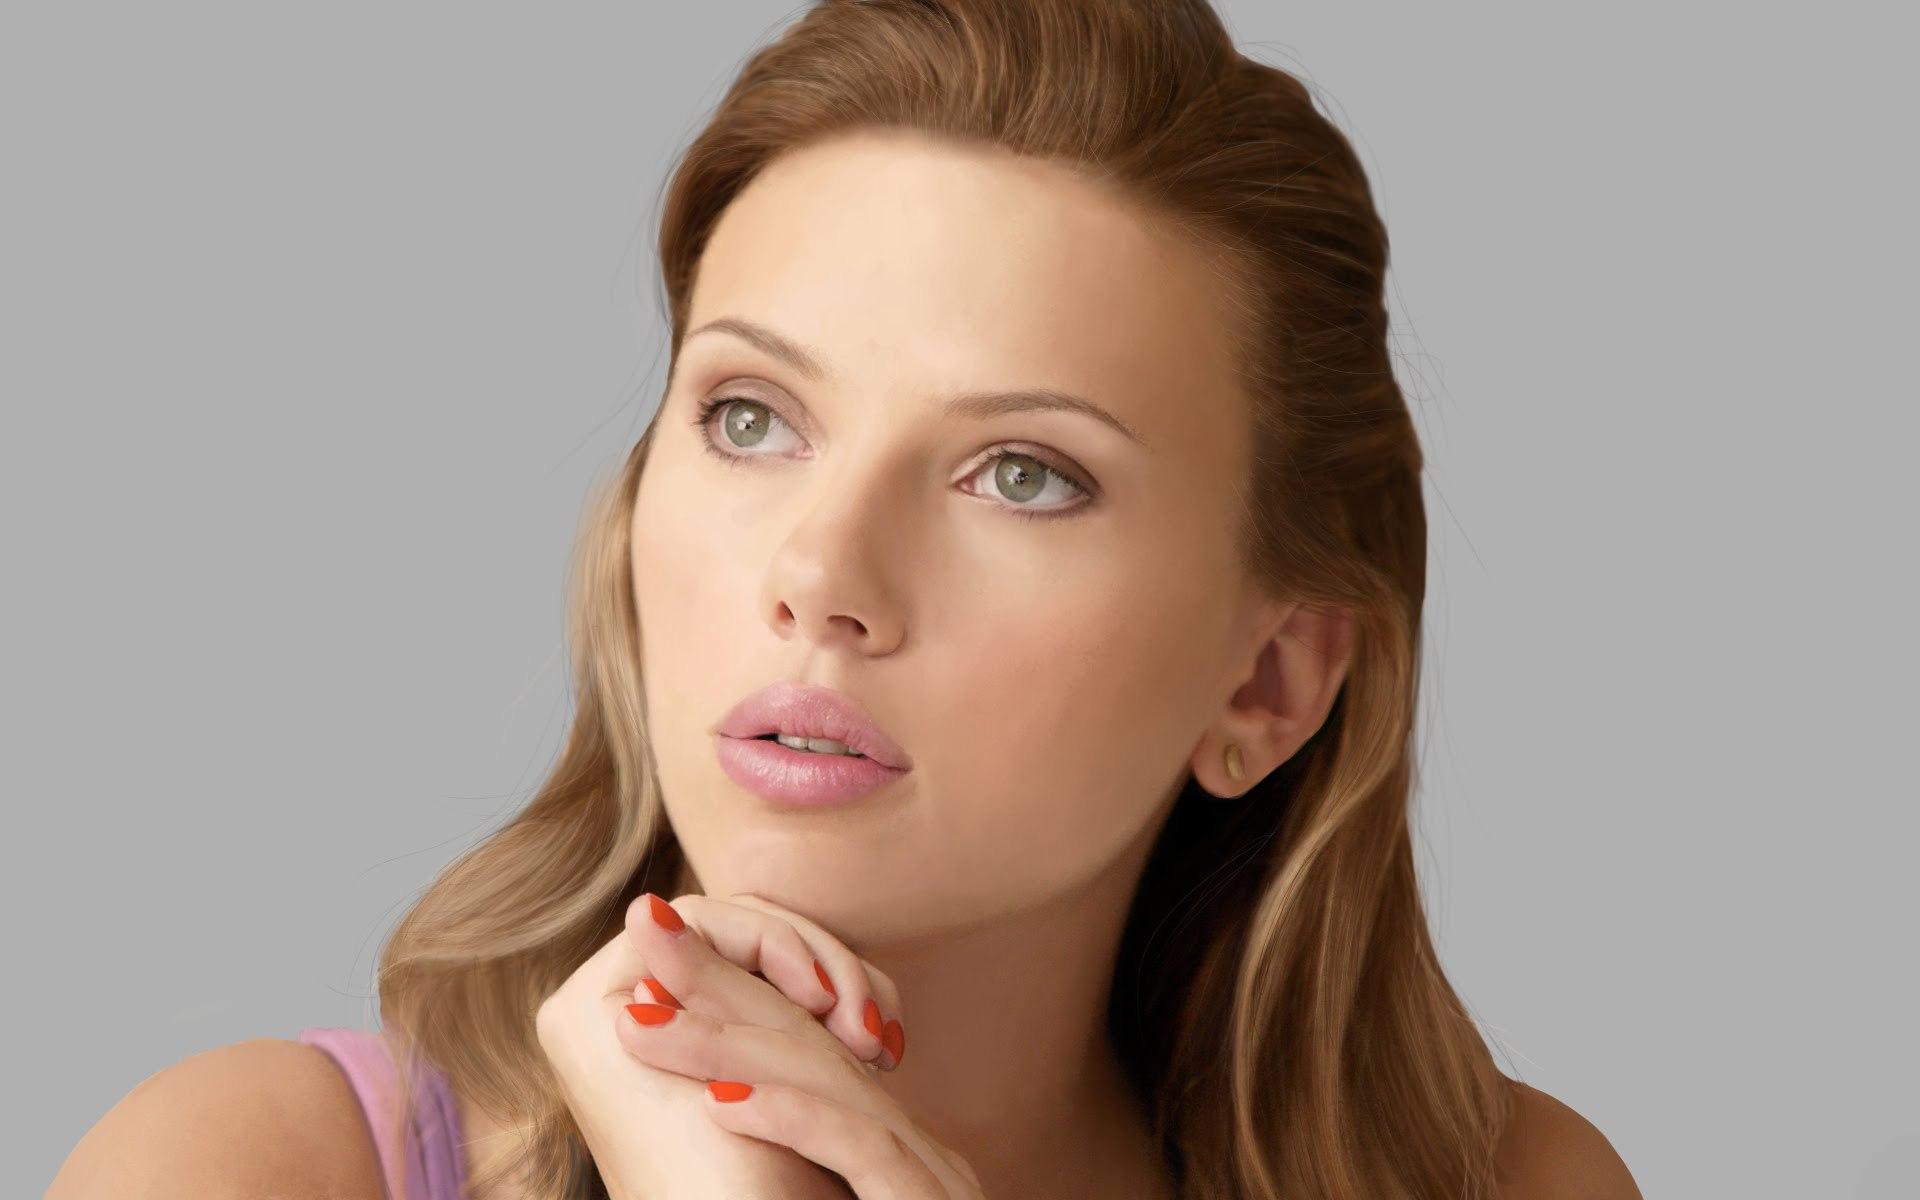 Scarlett Johansson Computer Wallpaper